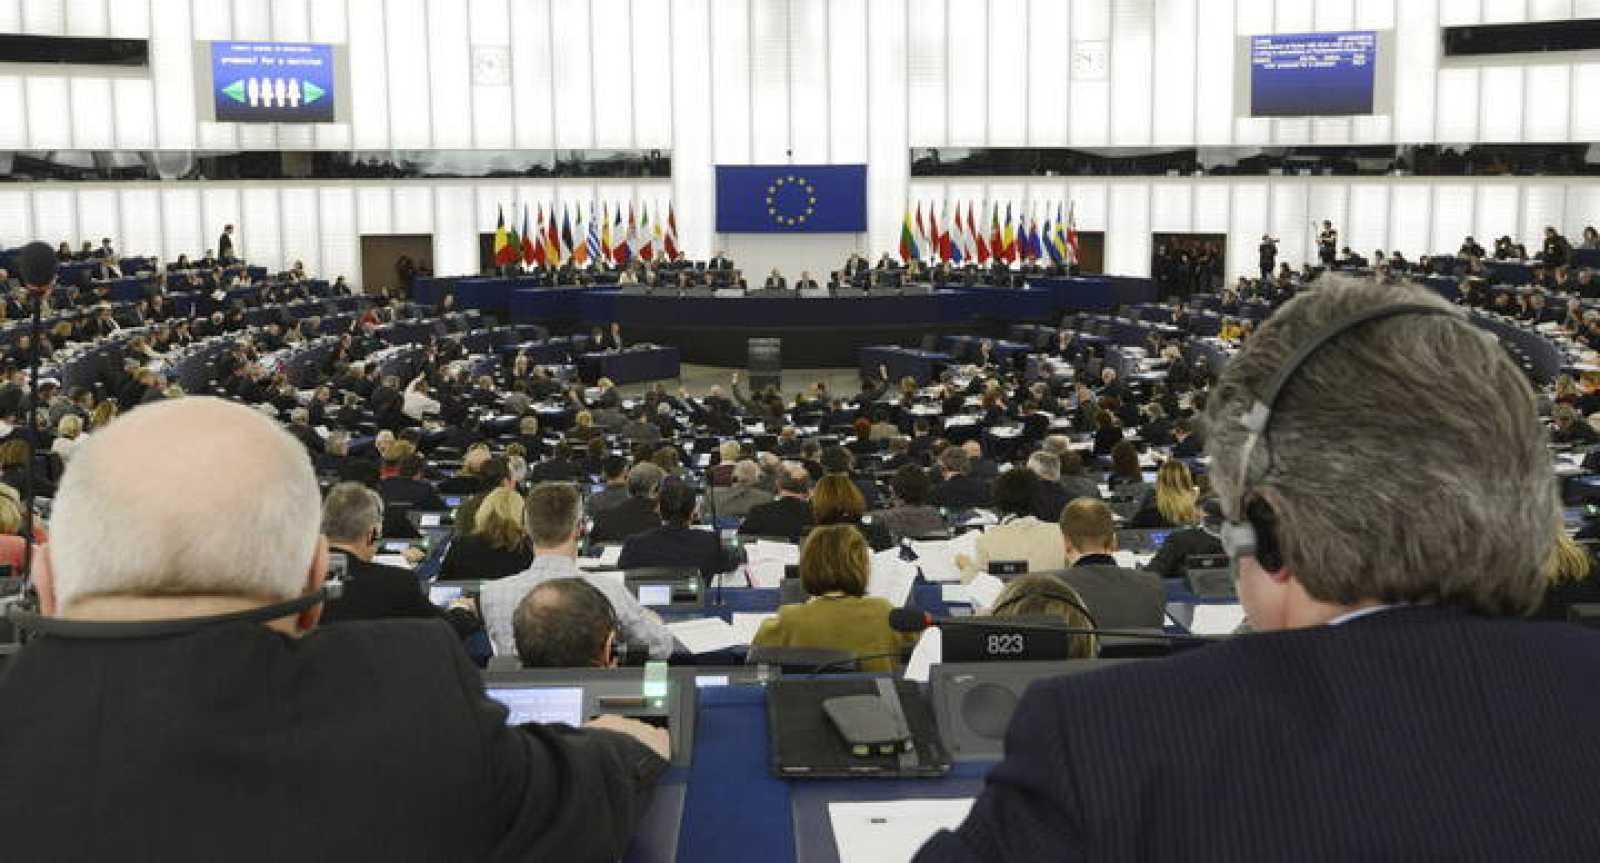 Diputados europeos asisten a una sesión plenaria del Parlamento Europeo en Estrasburgo (Francia)